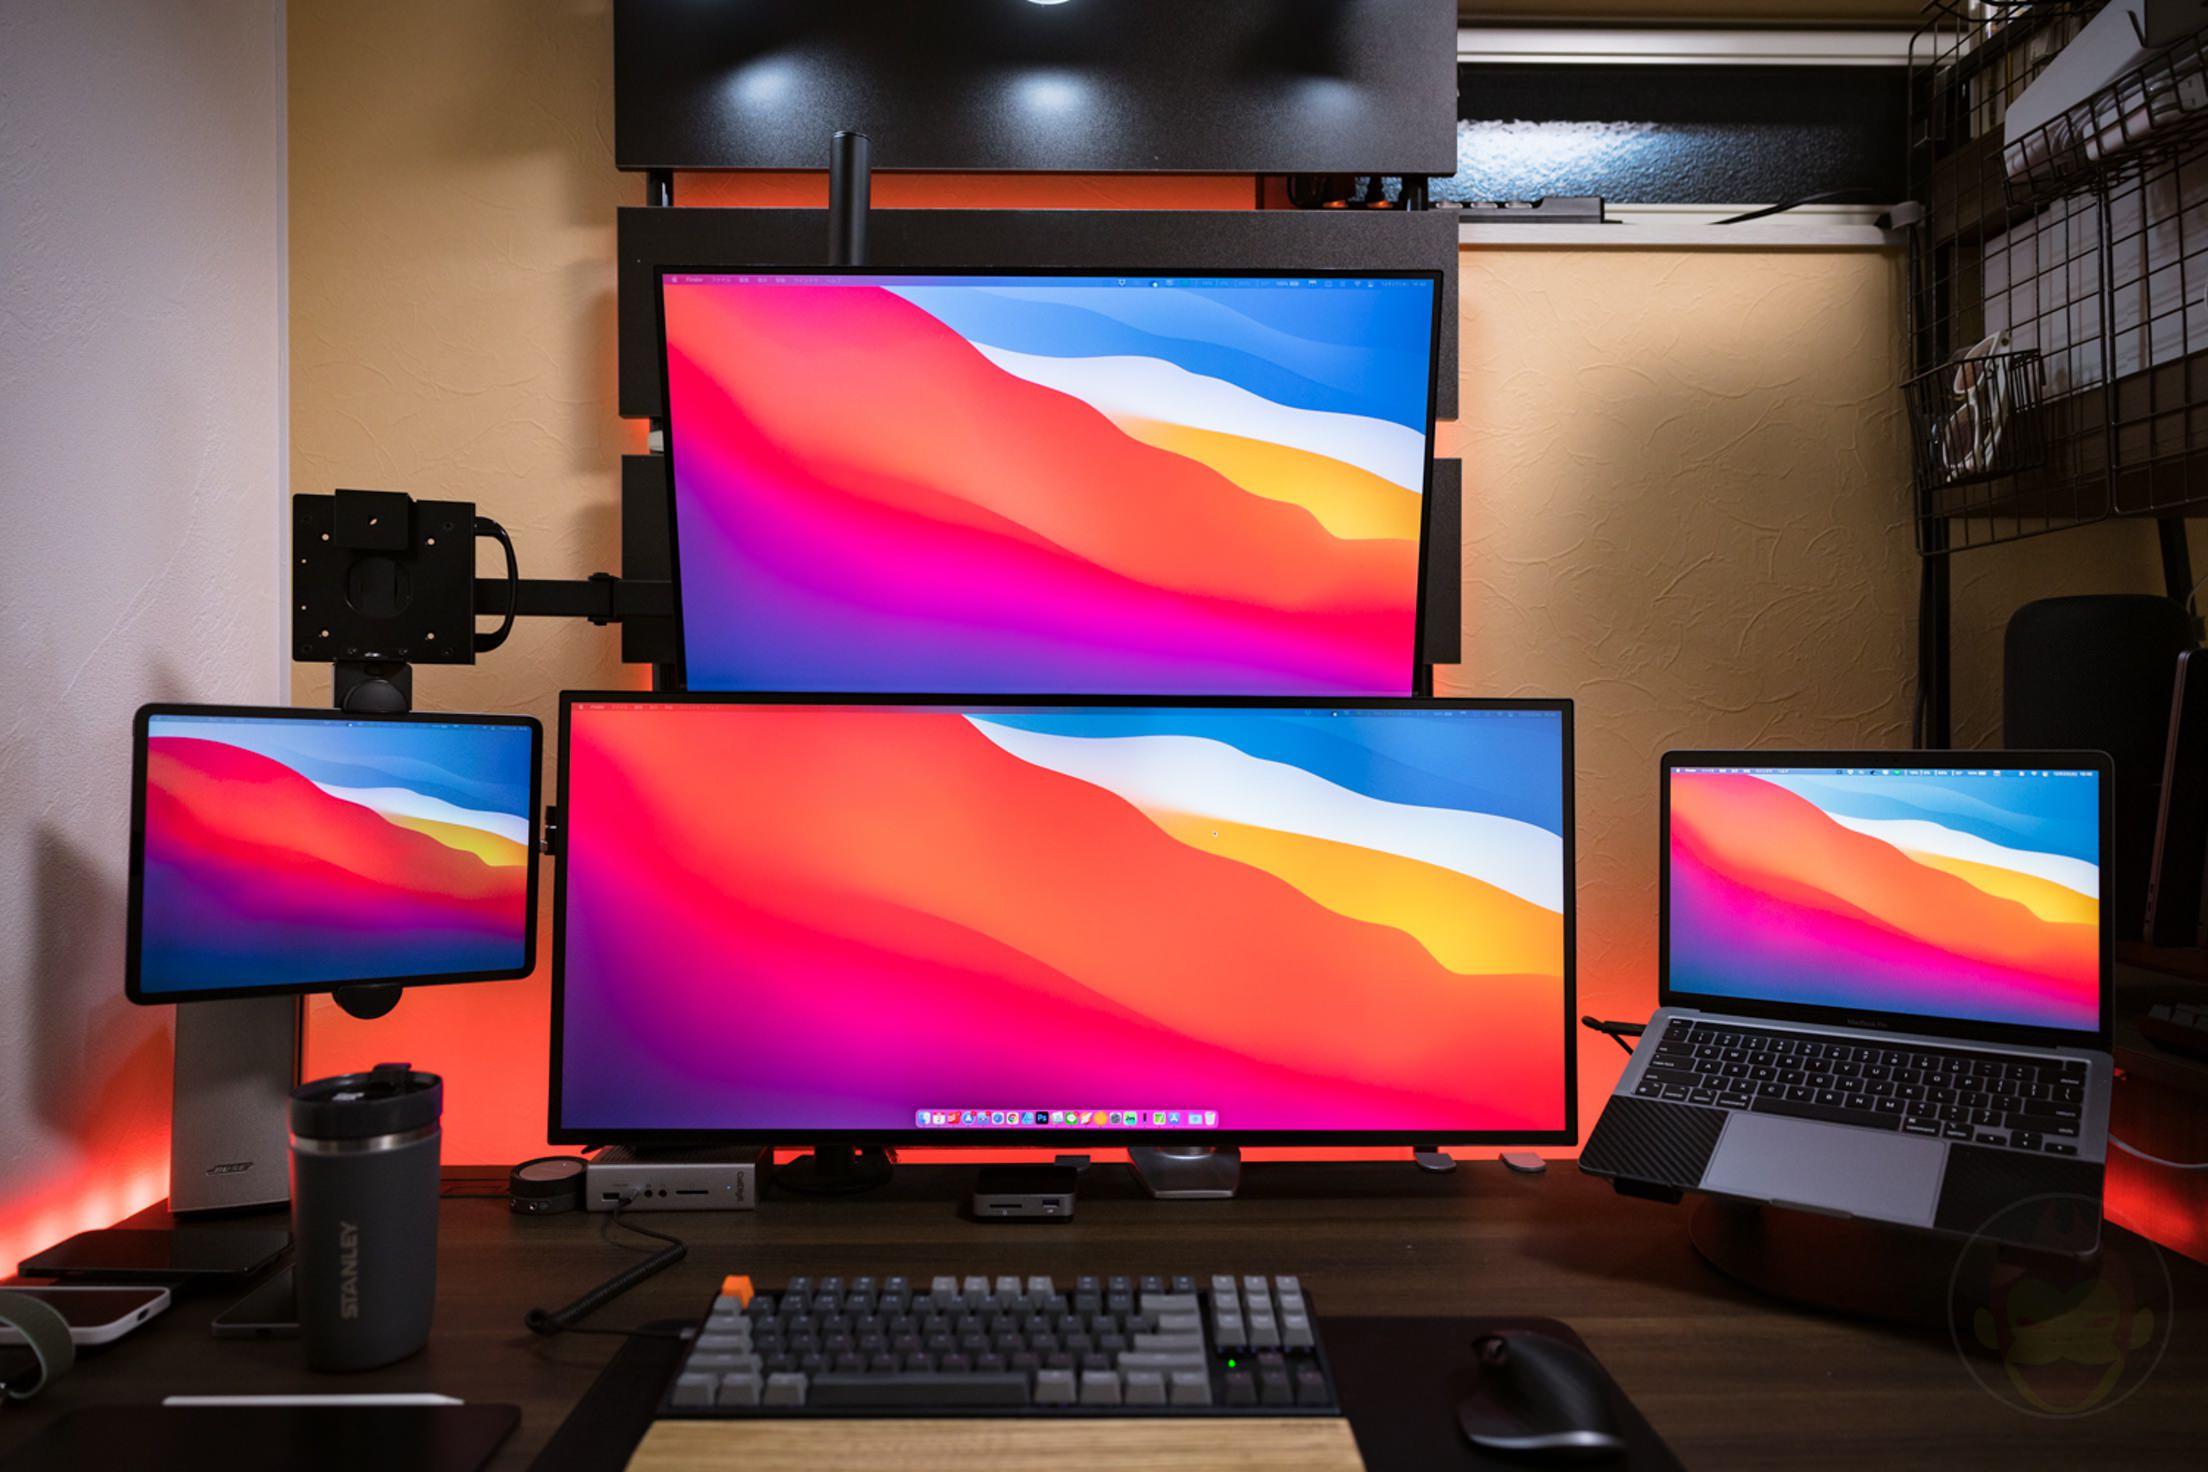 M1 MacBook Pro Workspace